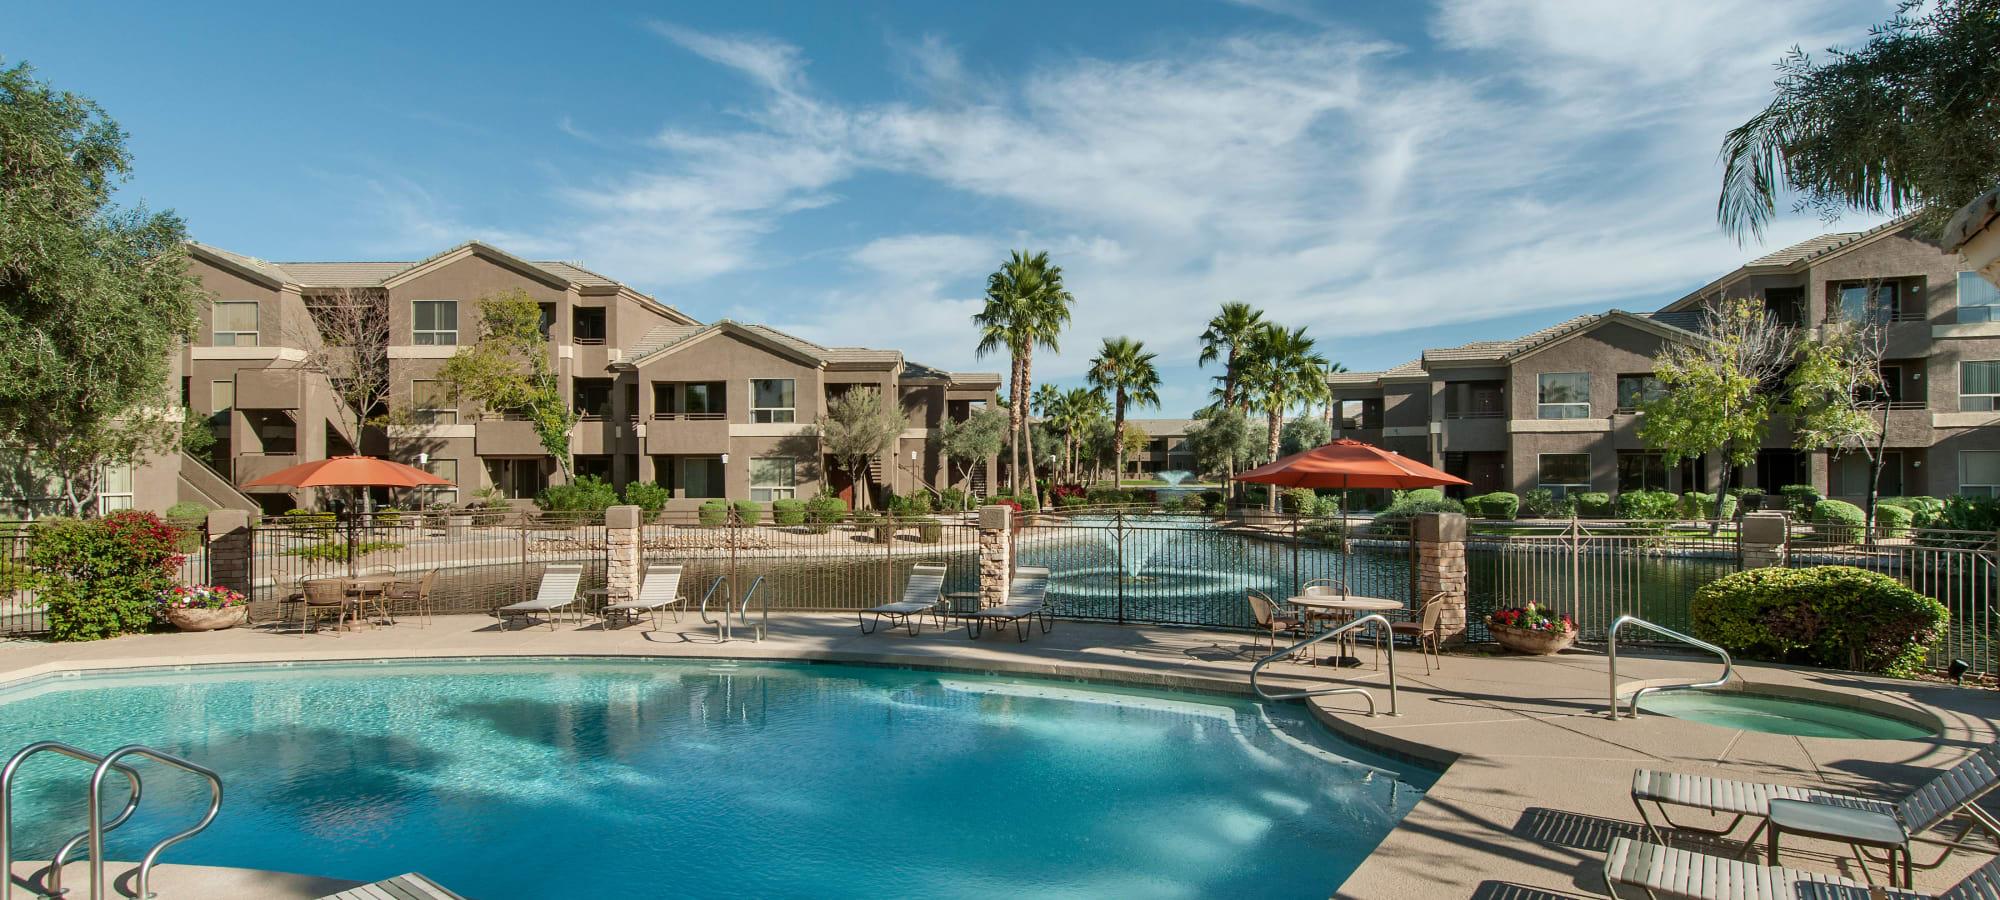 Resident community pool at Laguna at Arrowhead Ranch in Glendale, Arizona